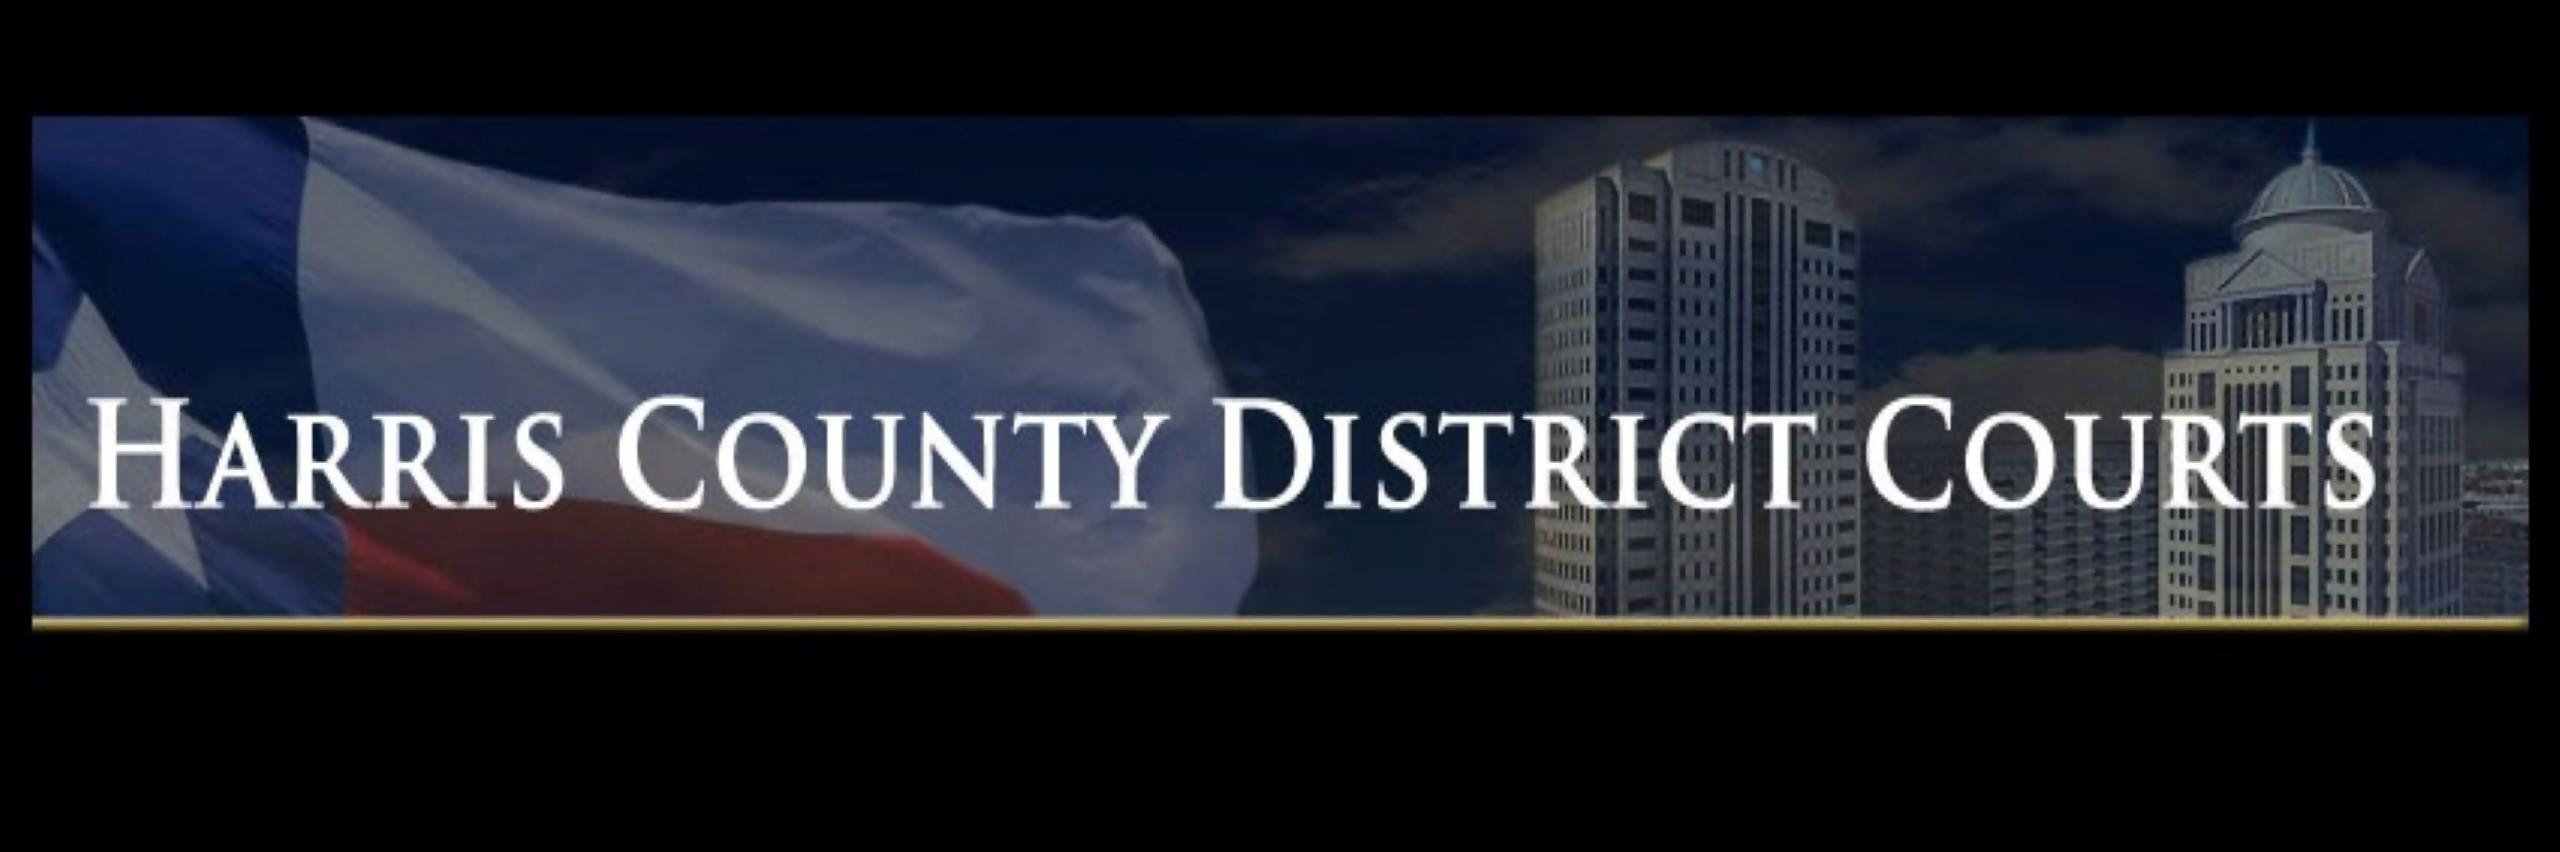 507th District Court - Live Stream